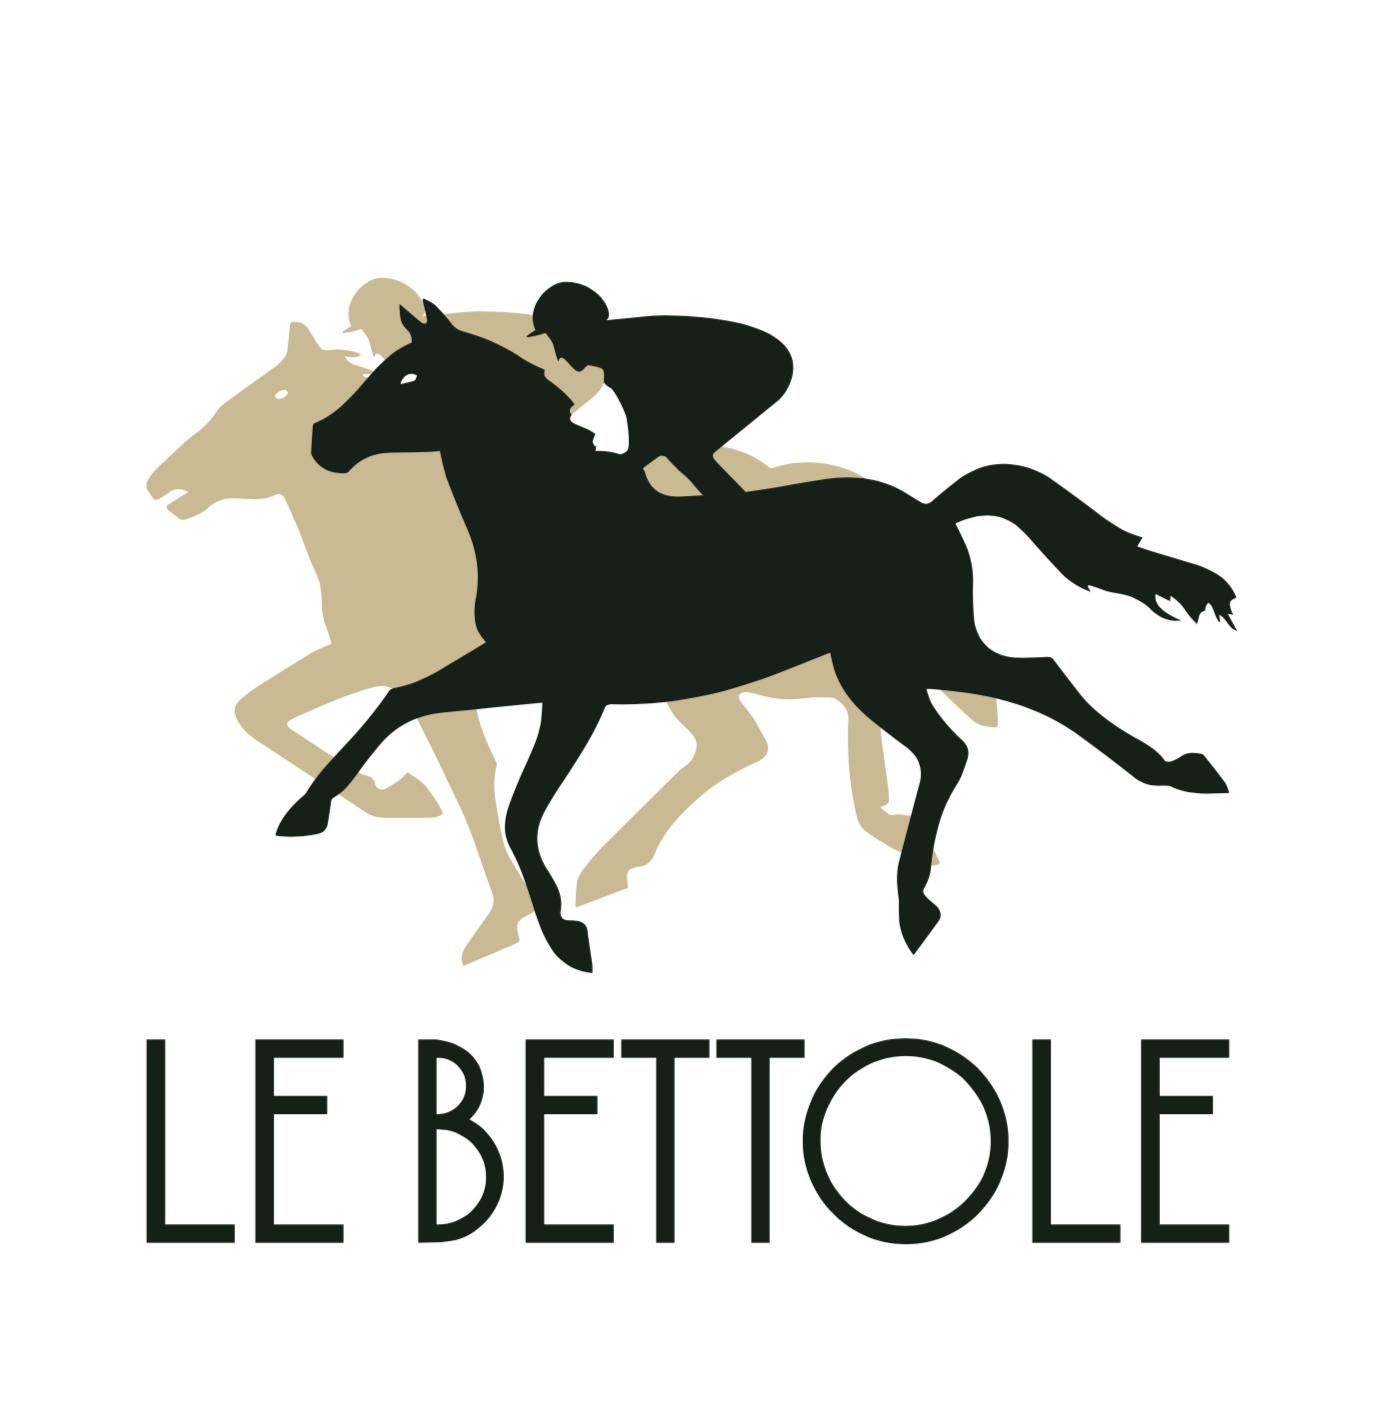 Ippodromo Le Bettole Varese